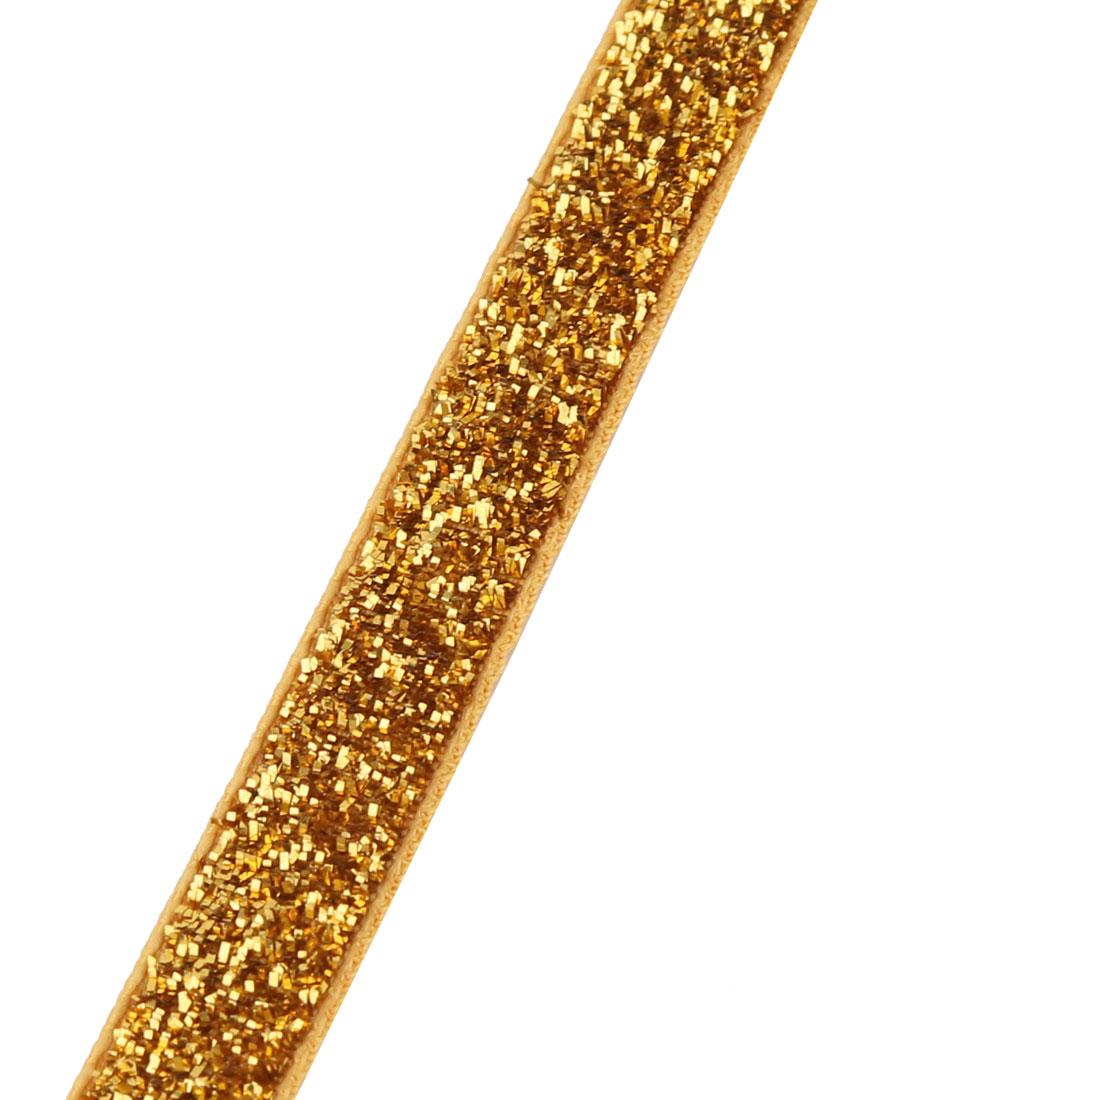 Decoration Velvet Bling Ribbon DIY Gift Headband Orange 50 Yard 1cm Width - image 3 of 4